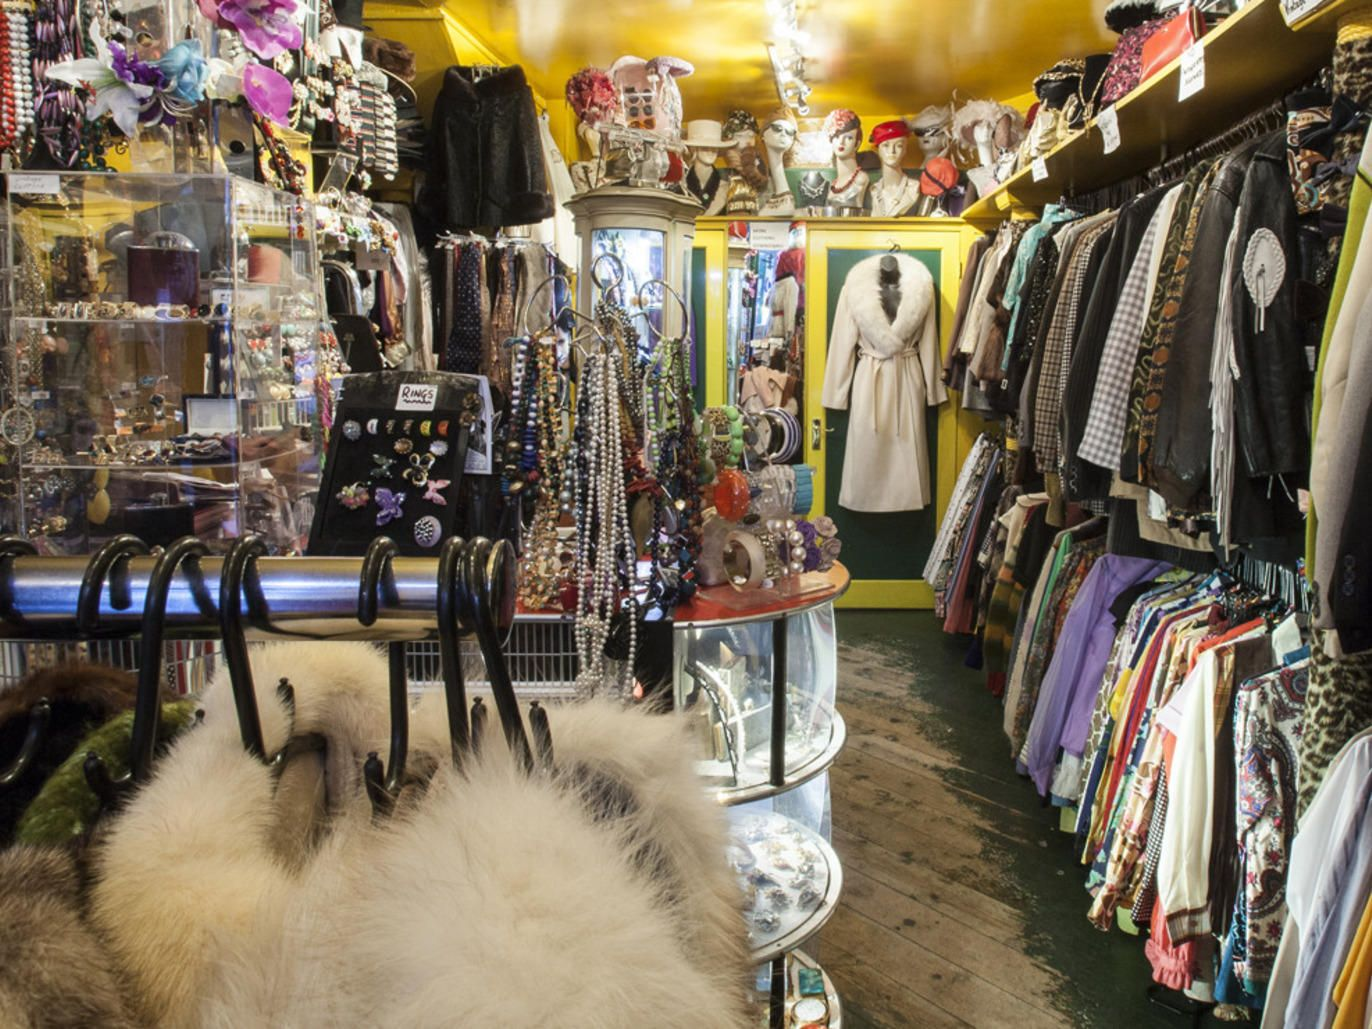 Vintage Shops In Central London London Shopping London England Travel London